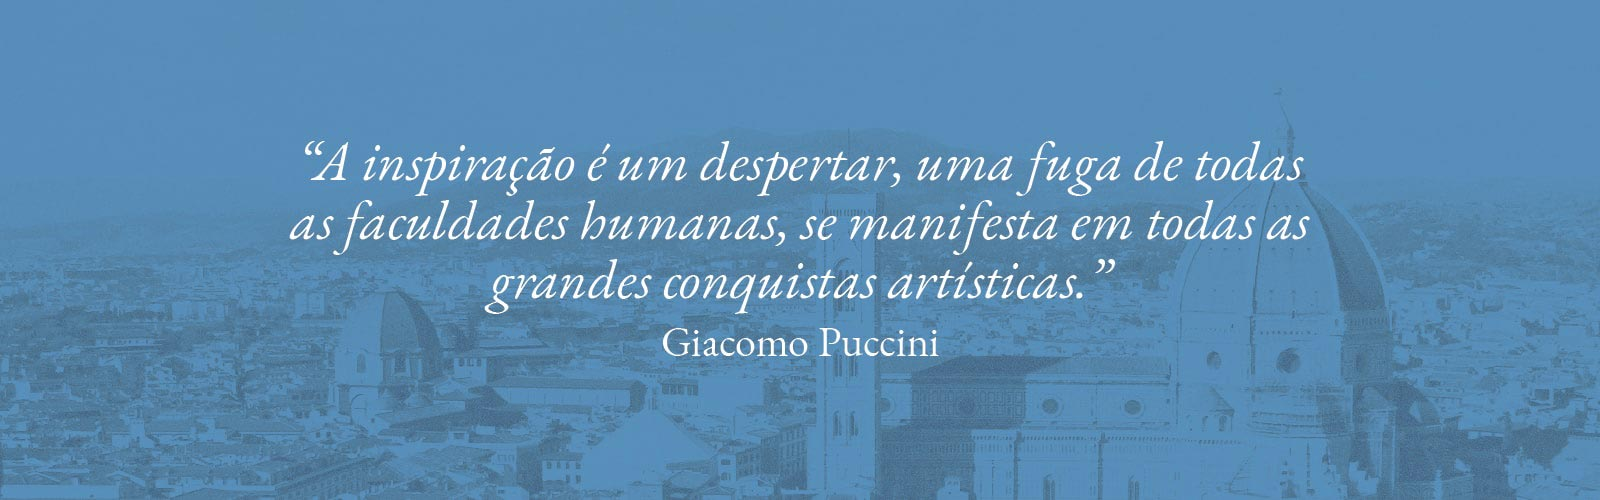 puccini-pt-min